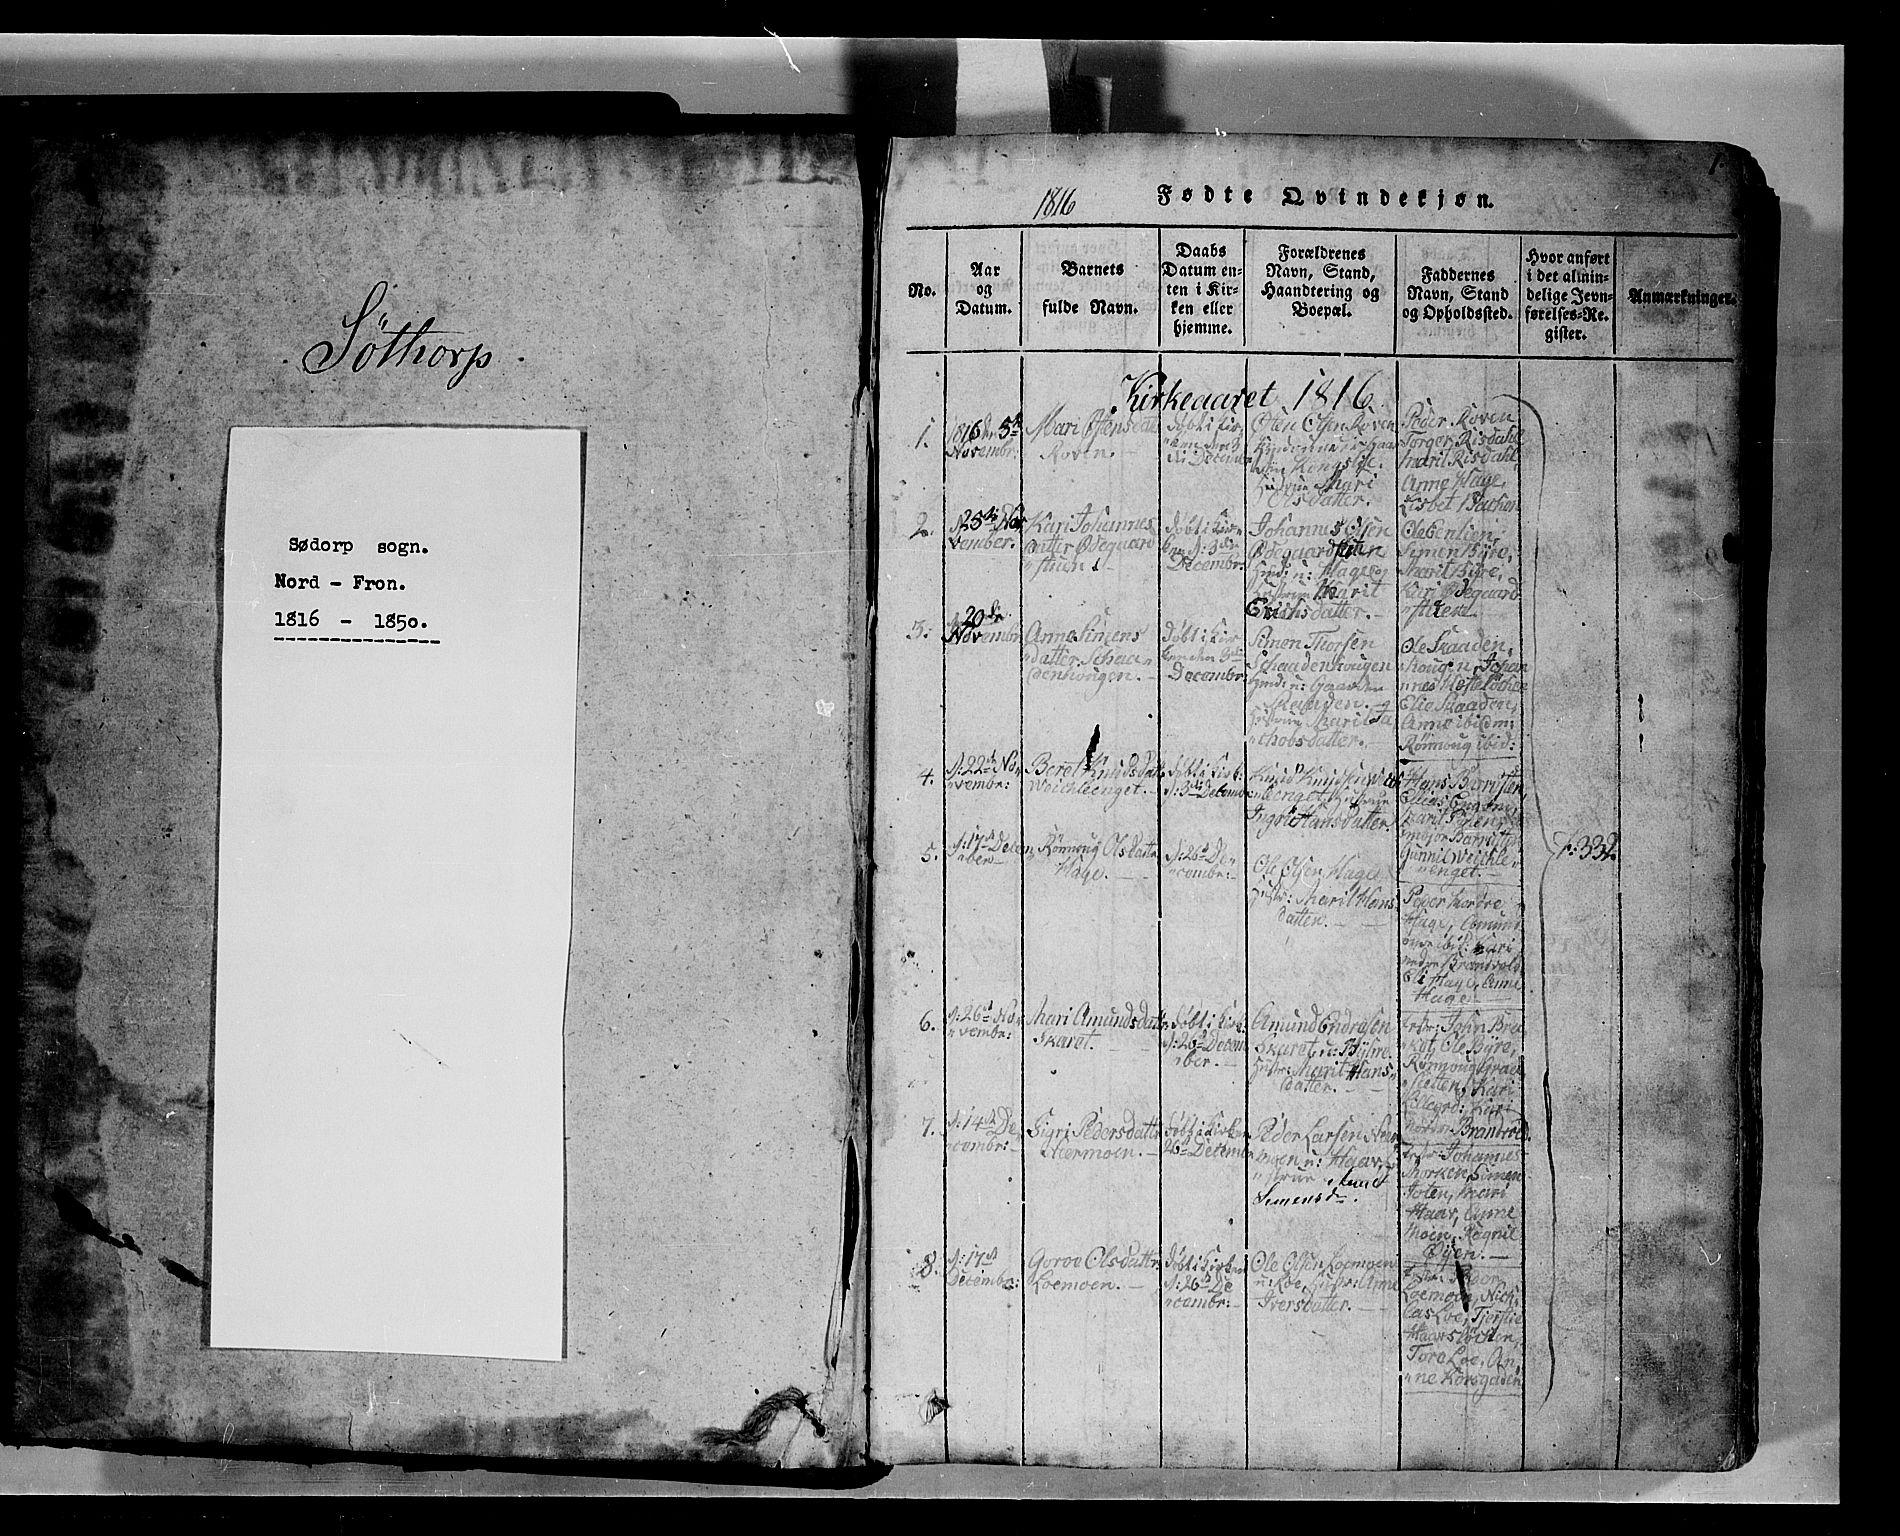 SAH, Fron prestekontor, H/Ha/Hab/L0004: Klokkerbok nr. 4, 1816-1850, s. 1